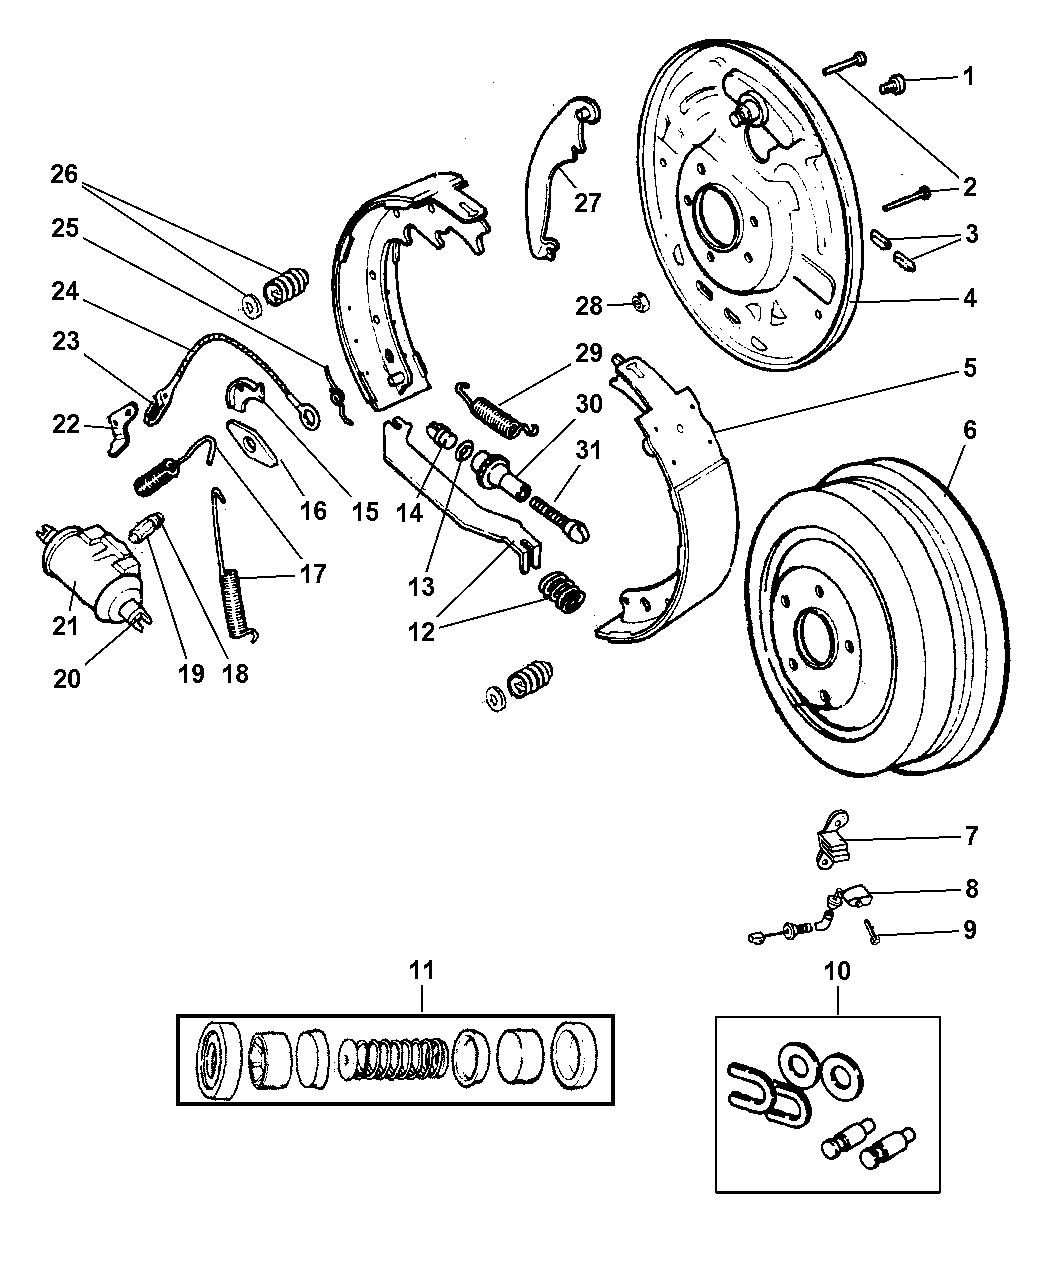 1999 Jeep Wrangler Rear Drum Brakes - Mopar Parts Giant